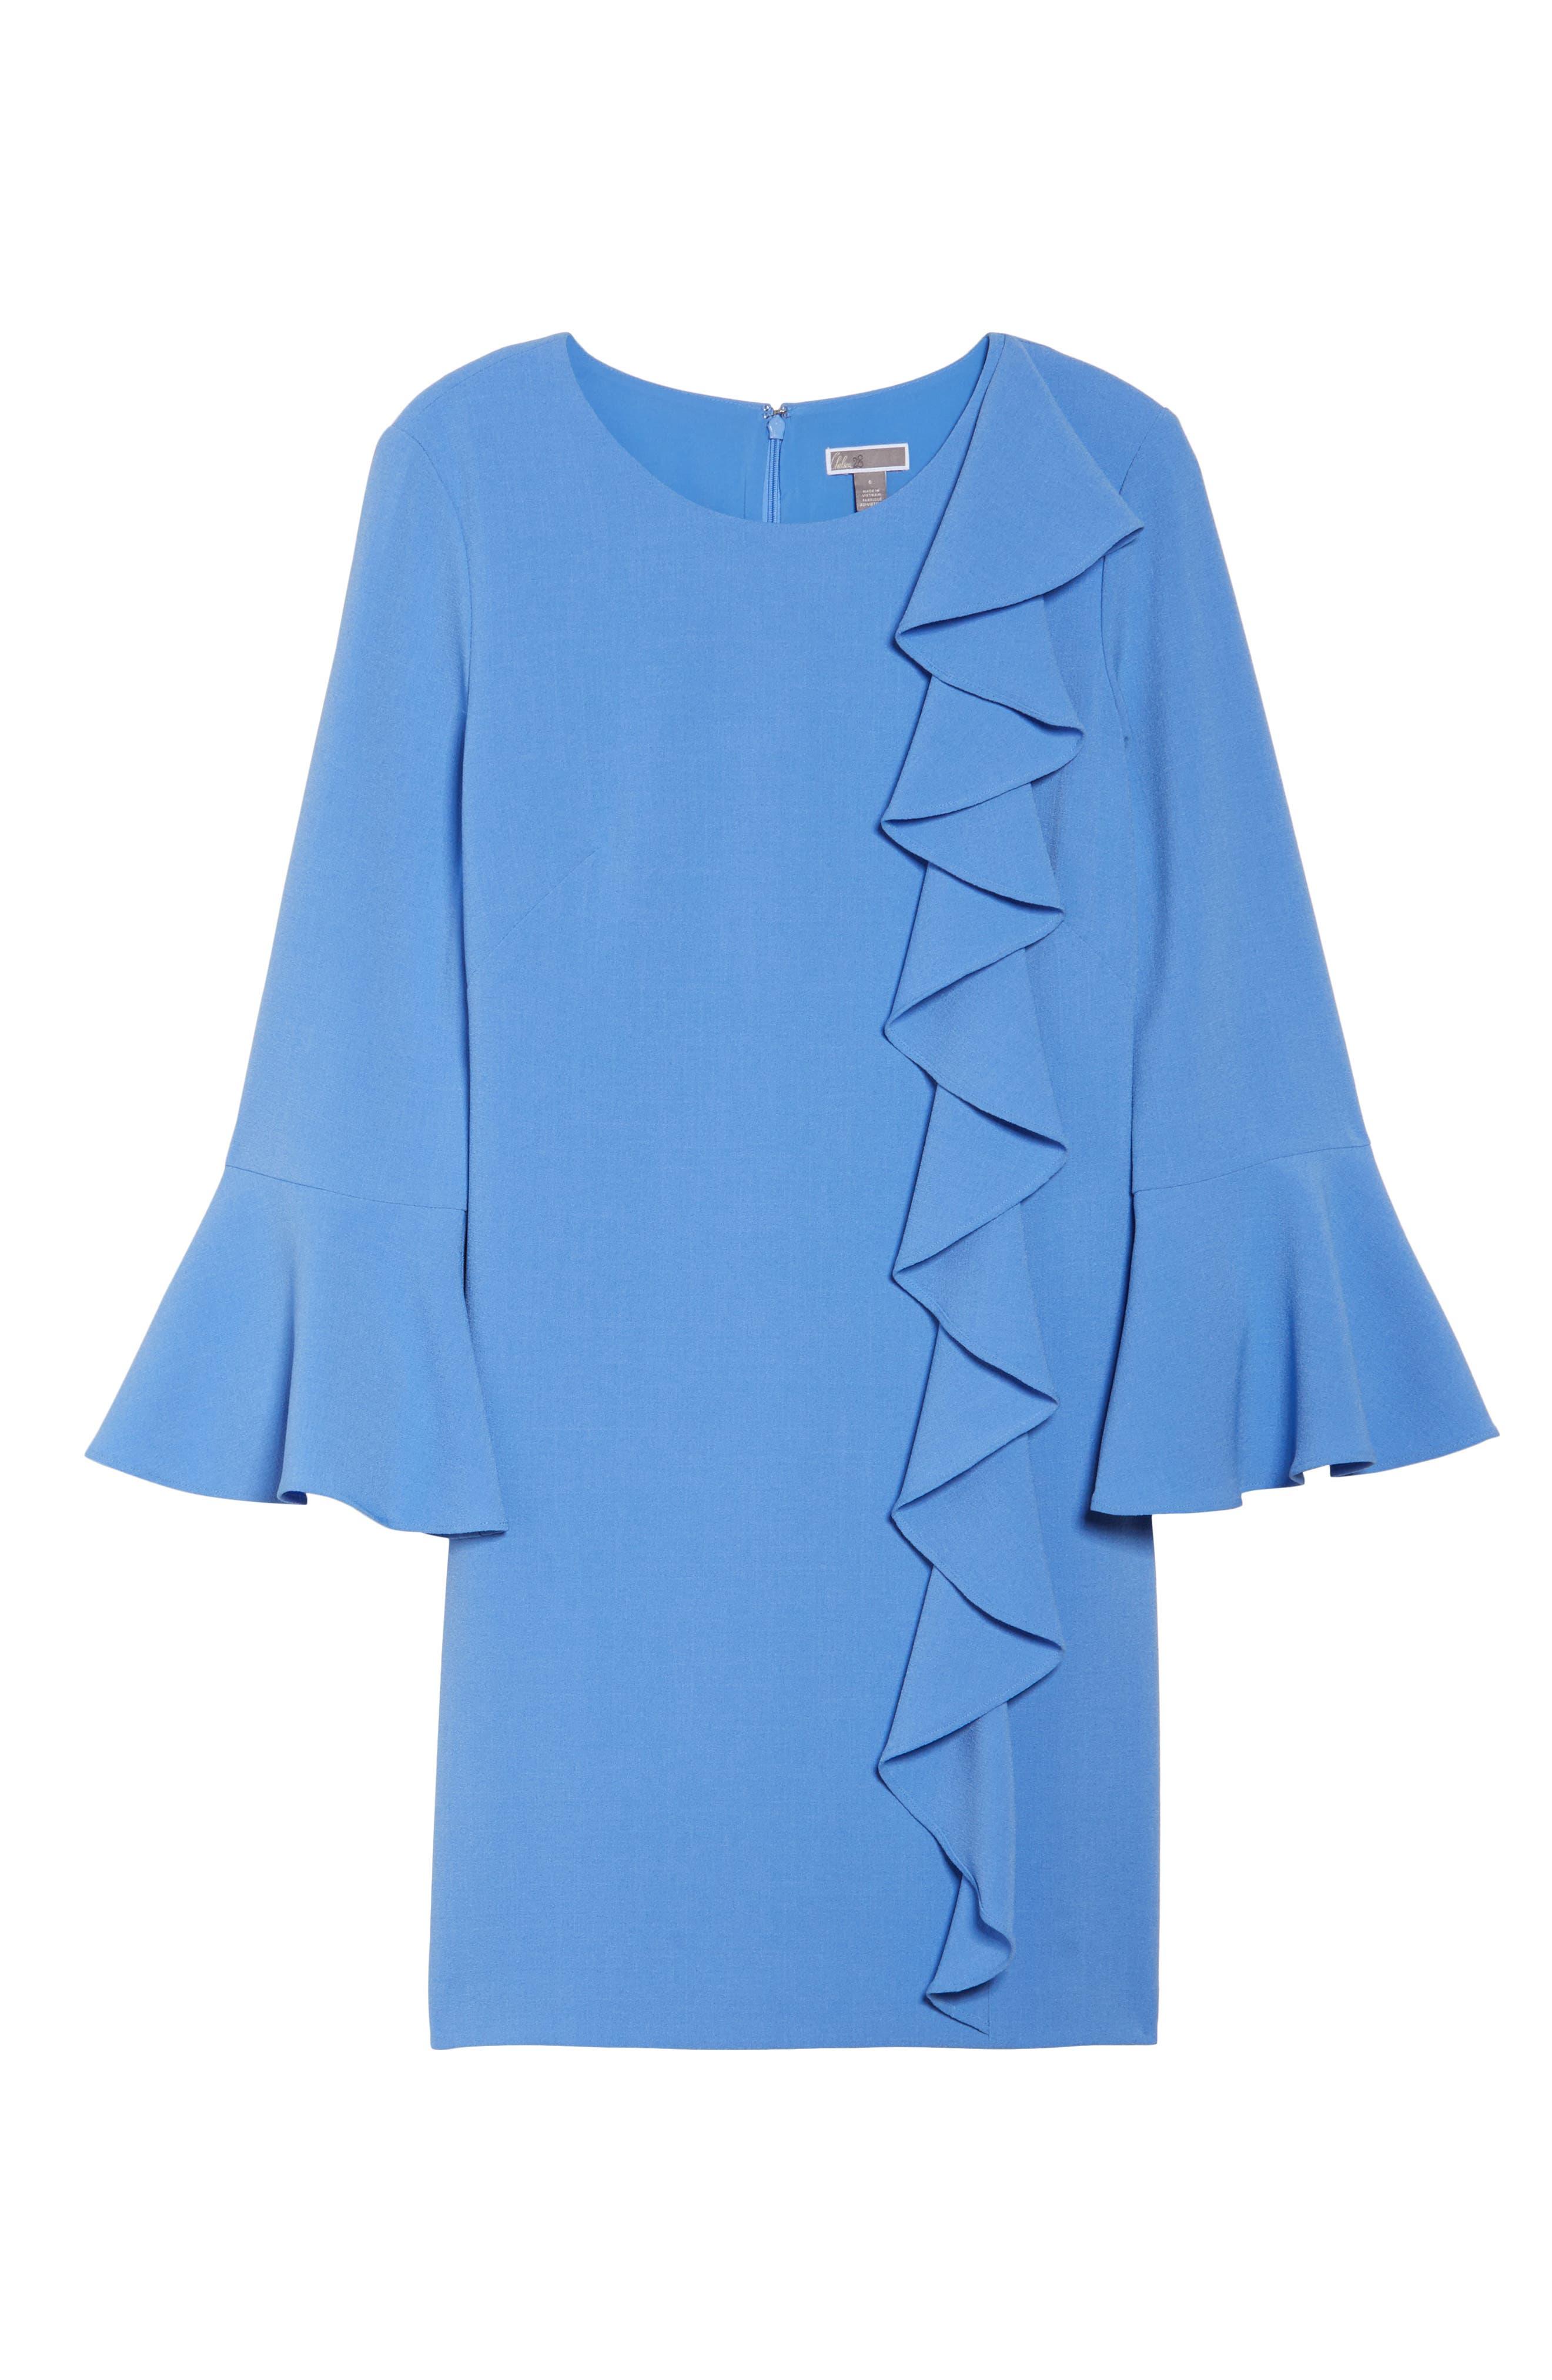 Ruffle Shift Dress,                             Alternate thumbnail 6, color,                             Blue Azurite